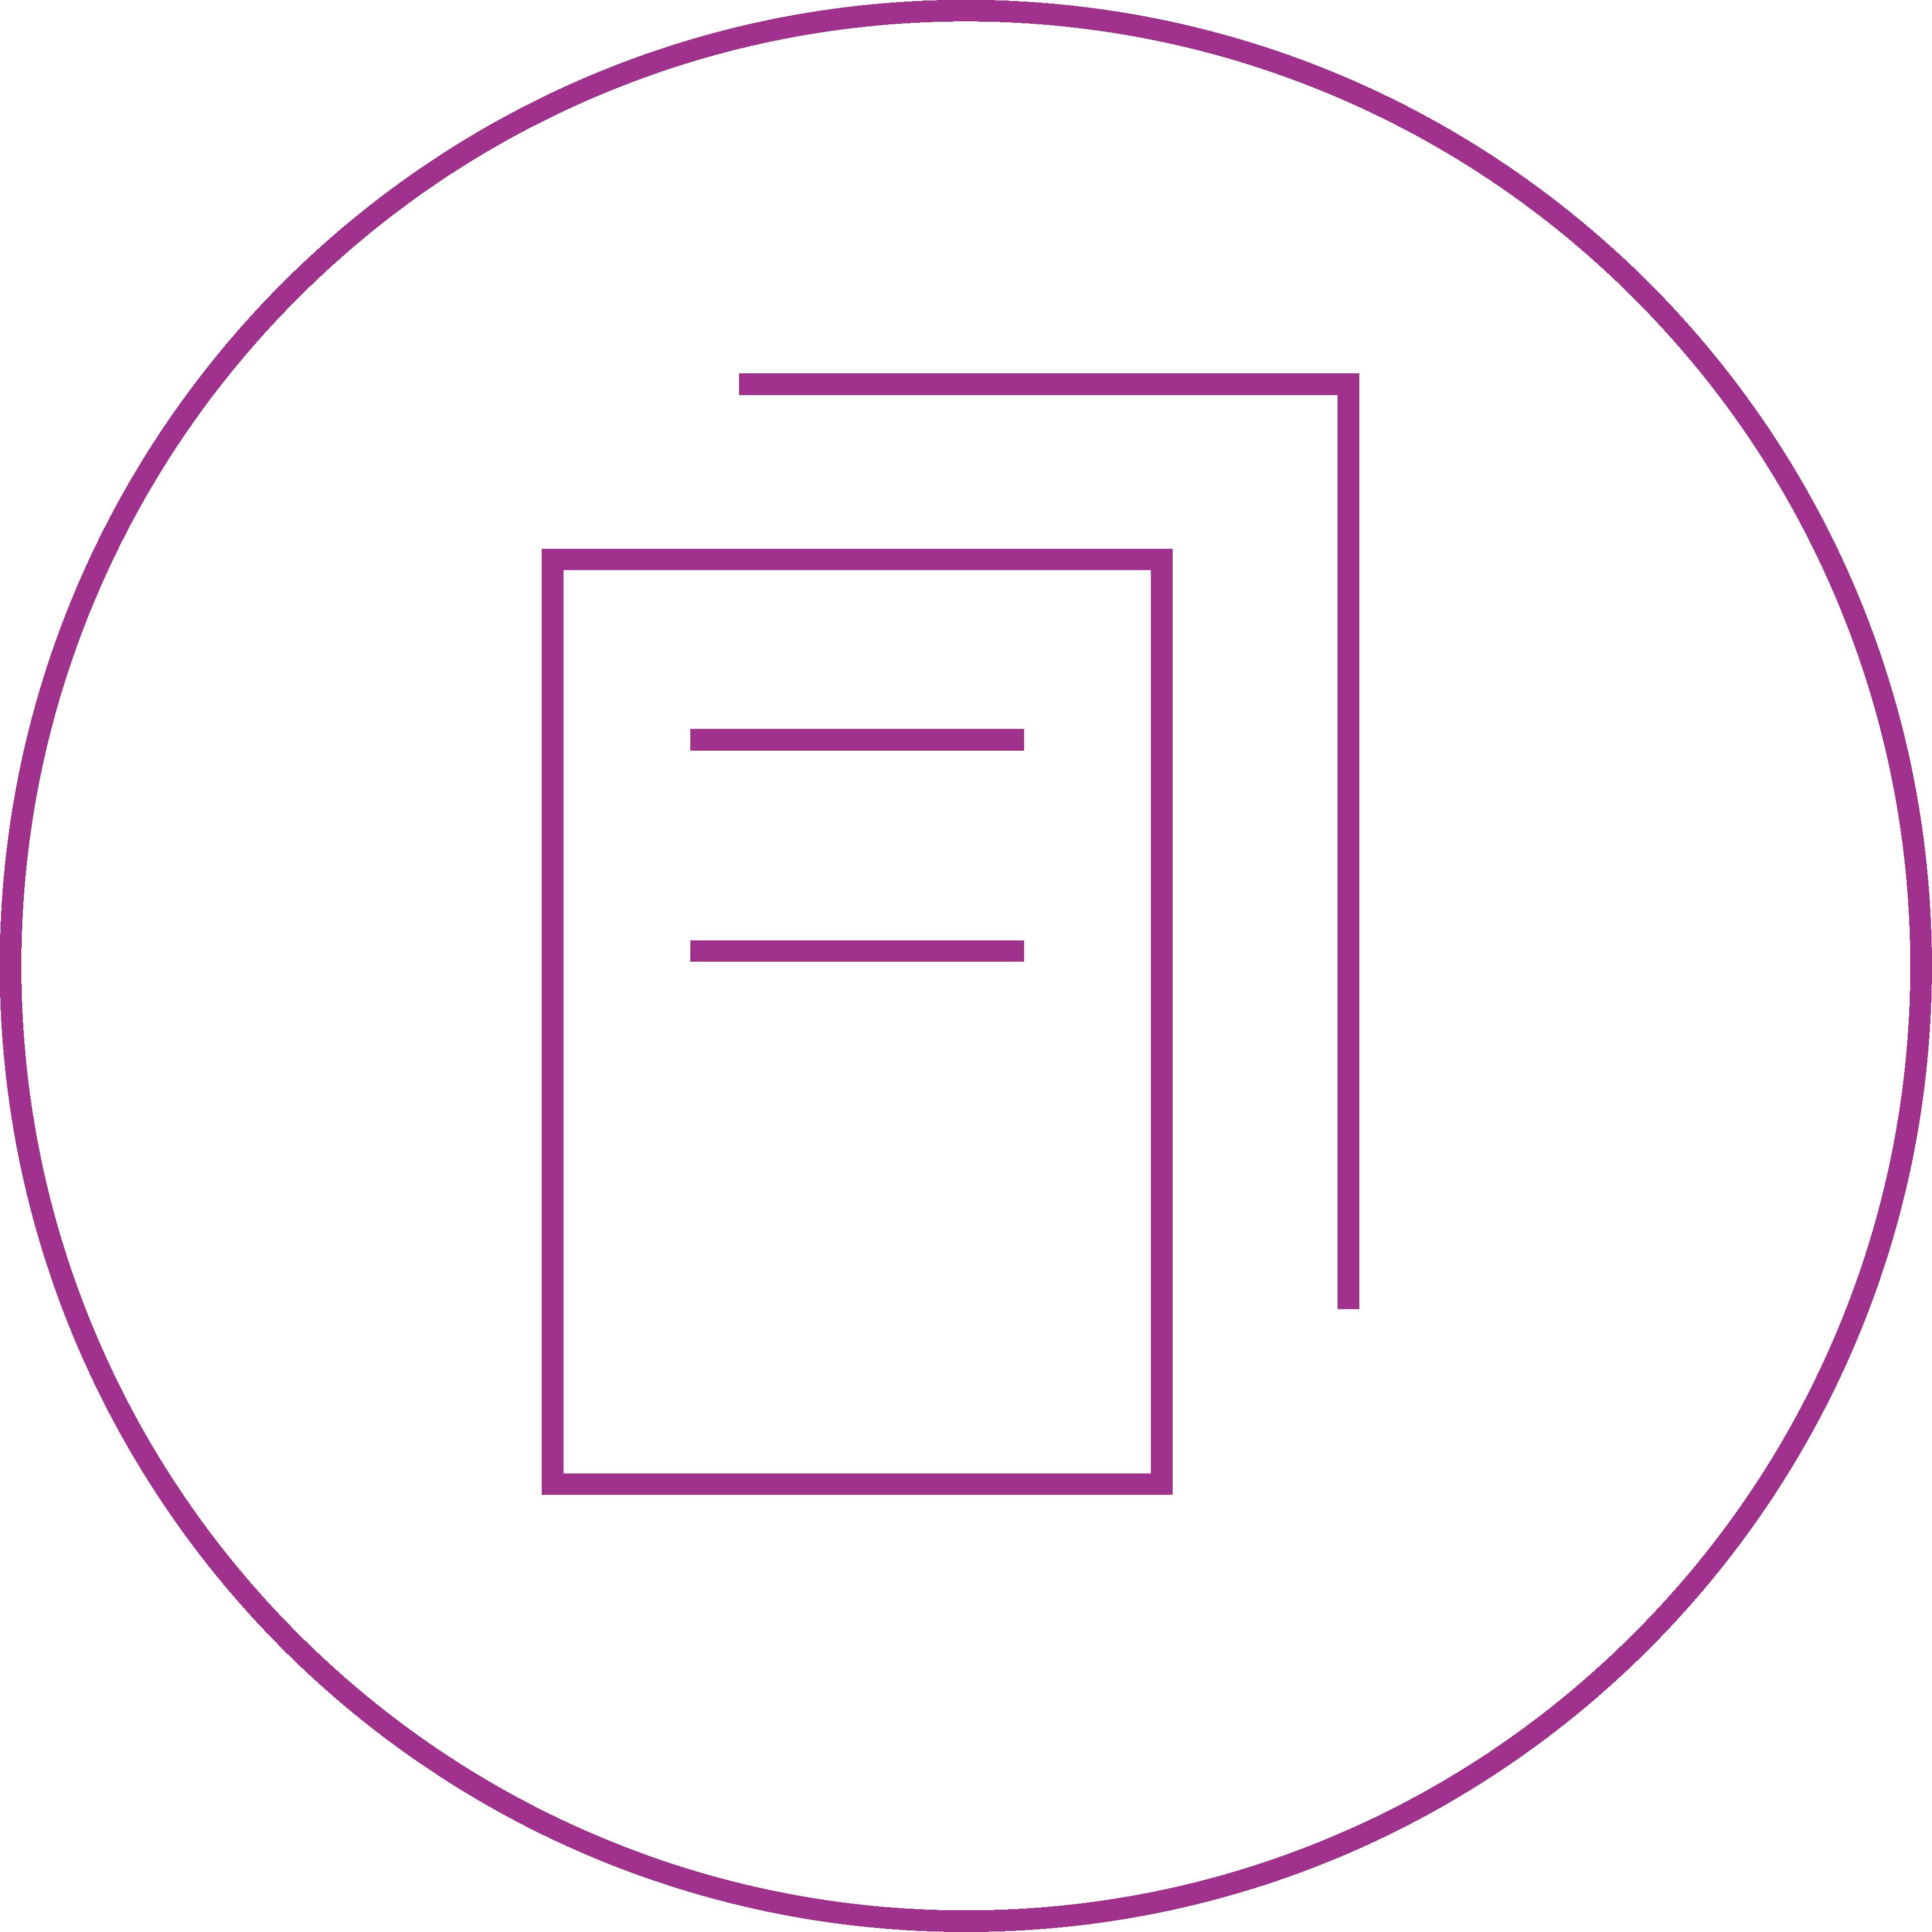 ICON_generate documentation